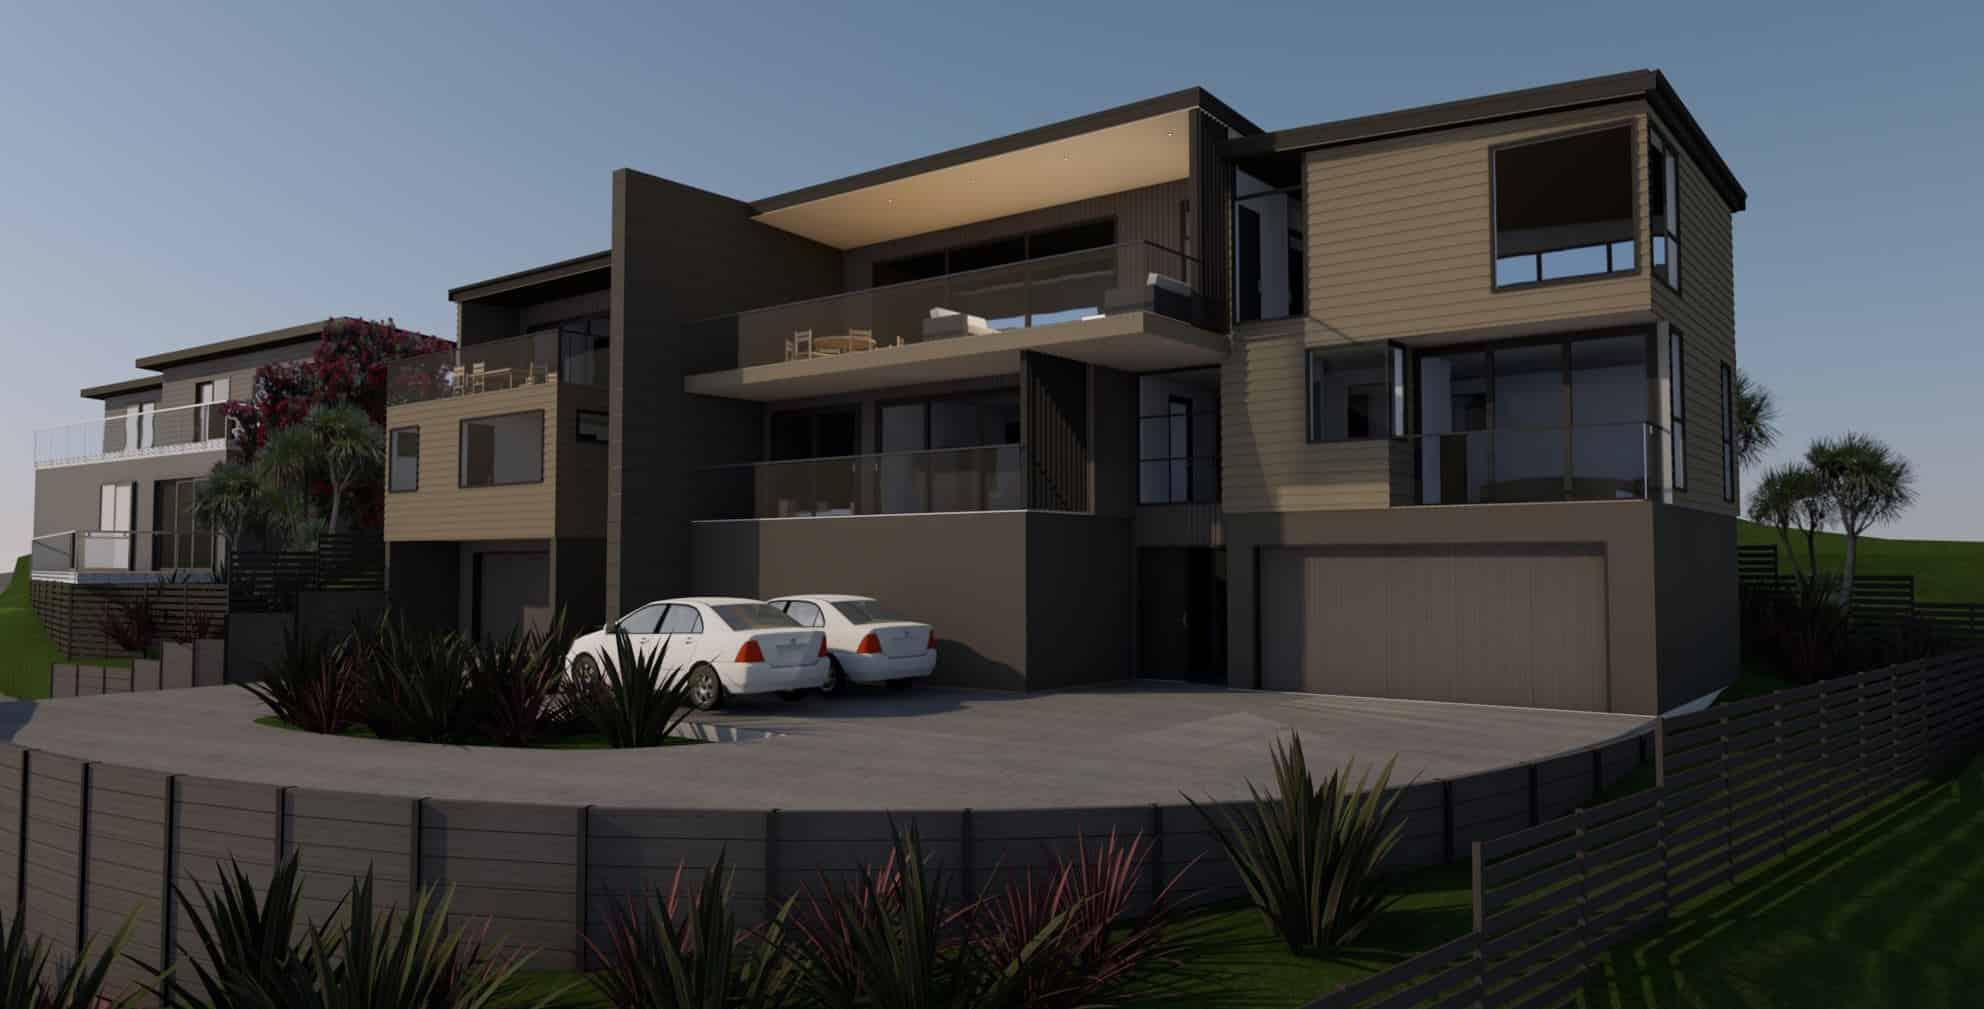 Matakiakia Duplex - Whangaparoa, Auckland - Front